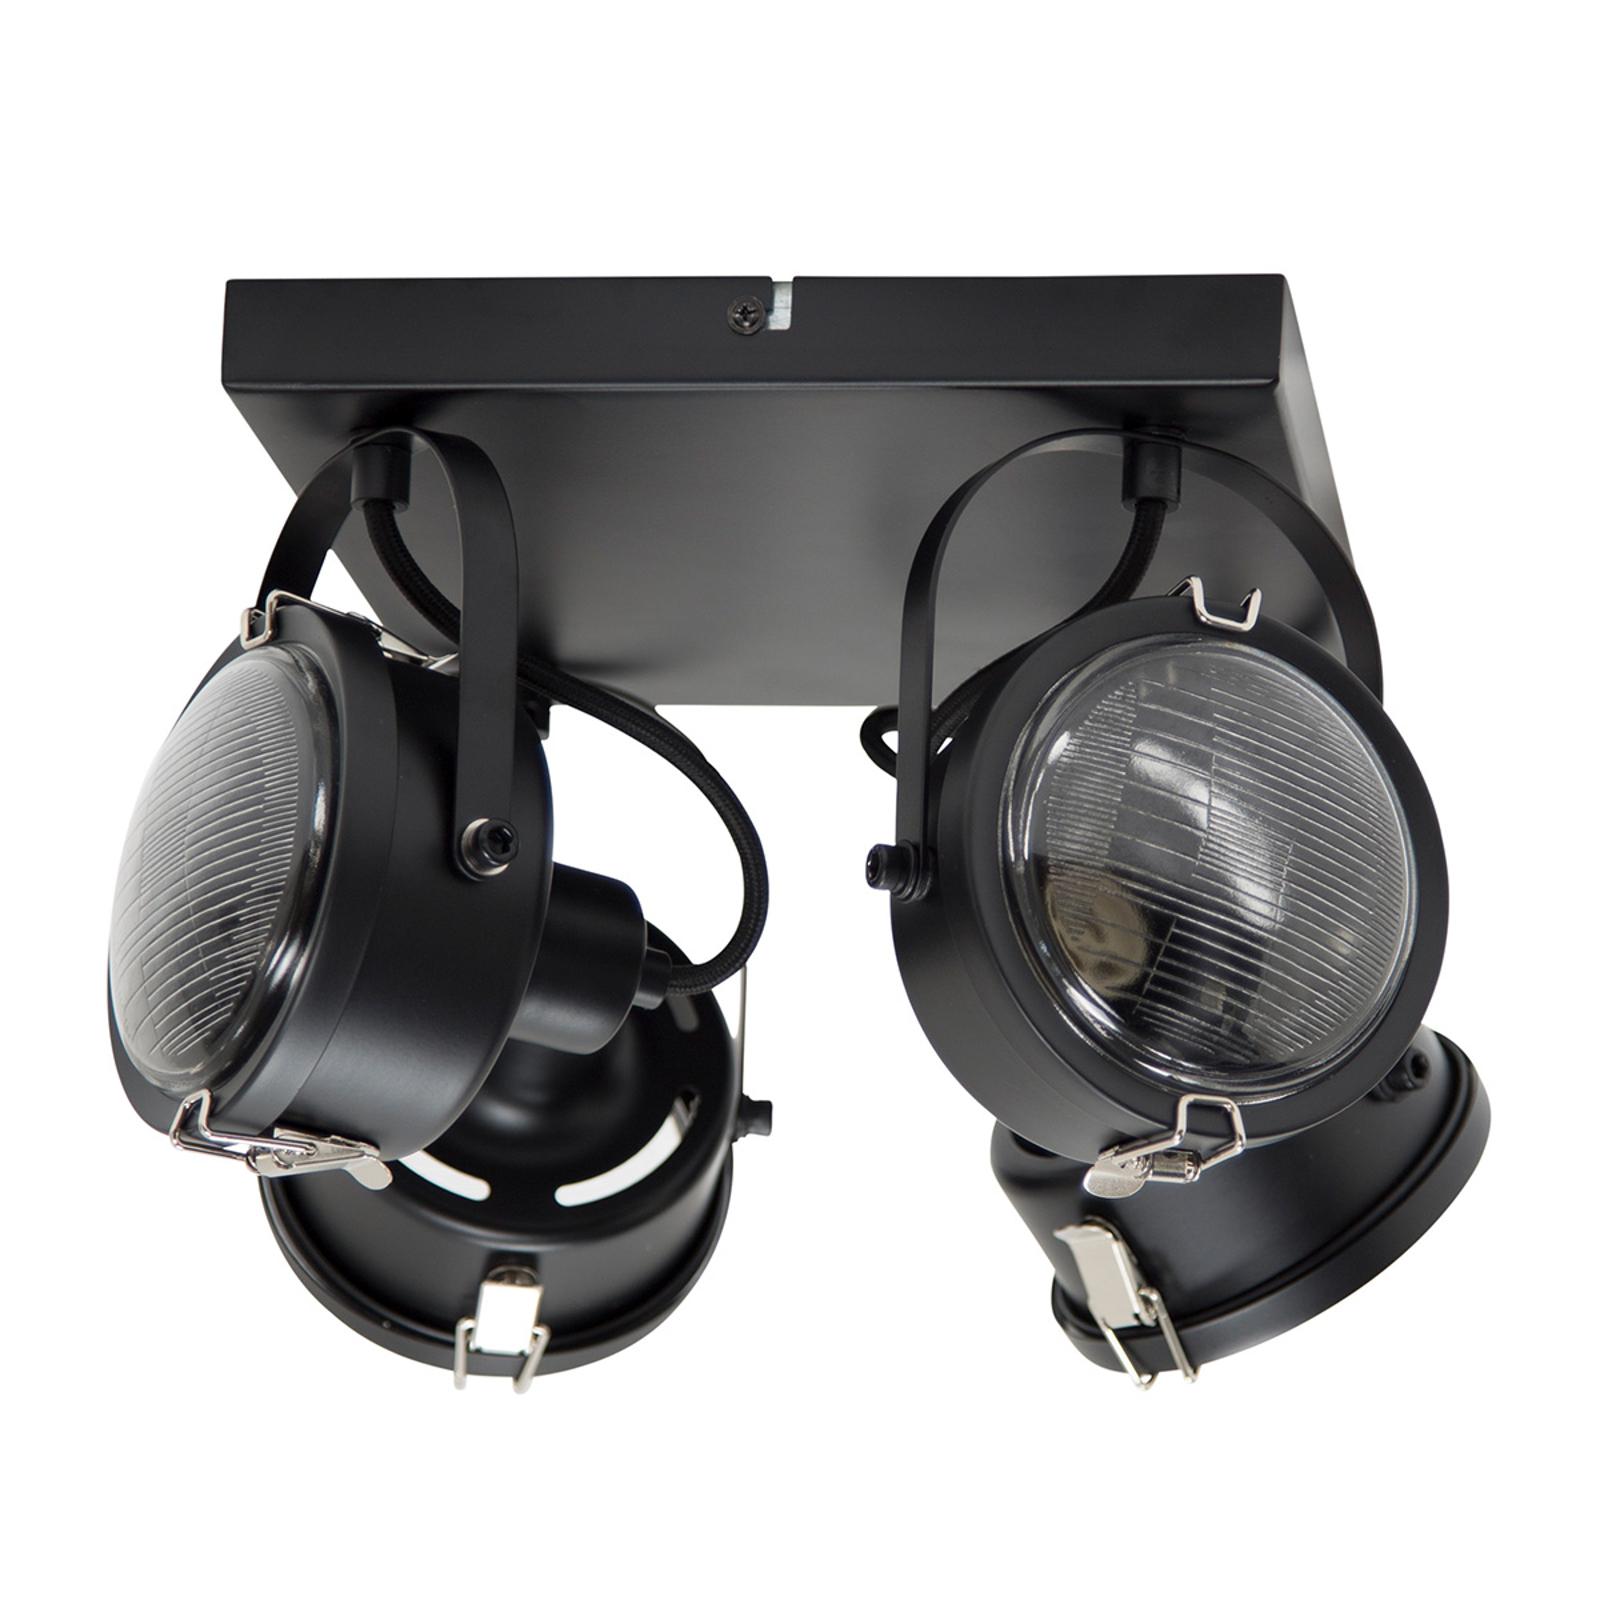 Kwadratowa lampa sufitowa Satellite czarna